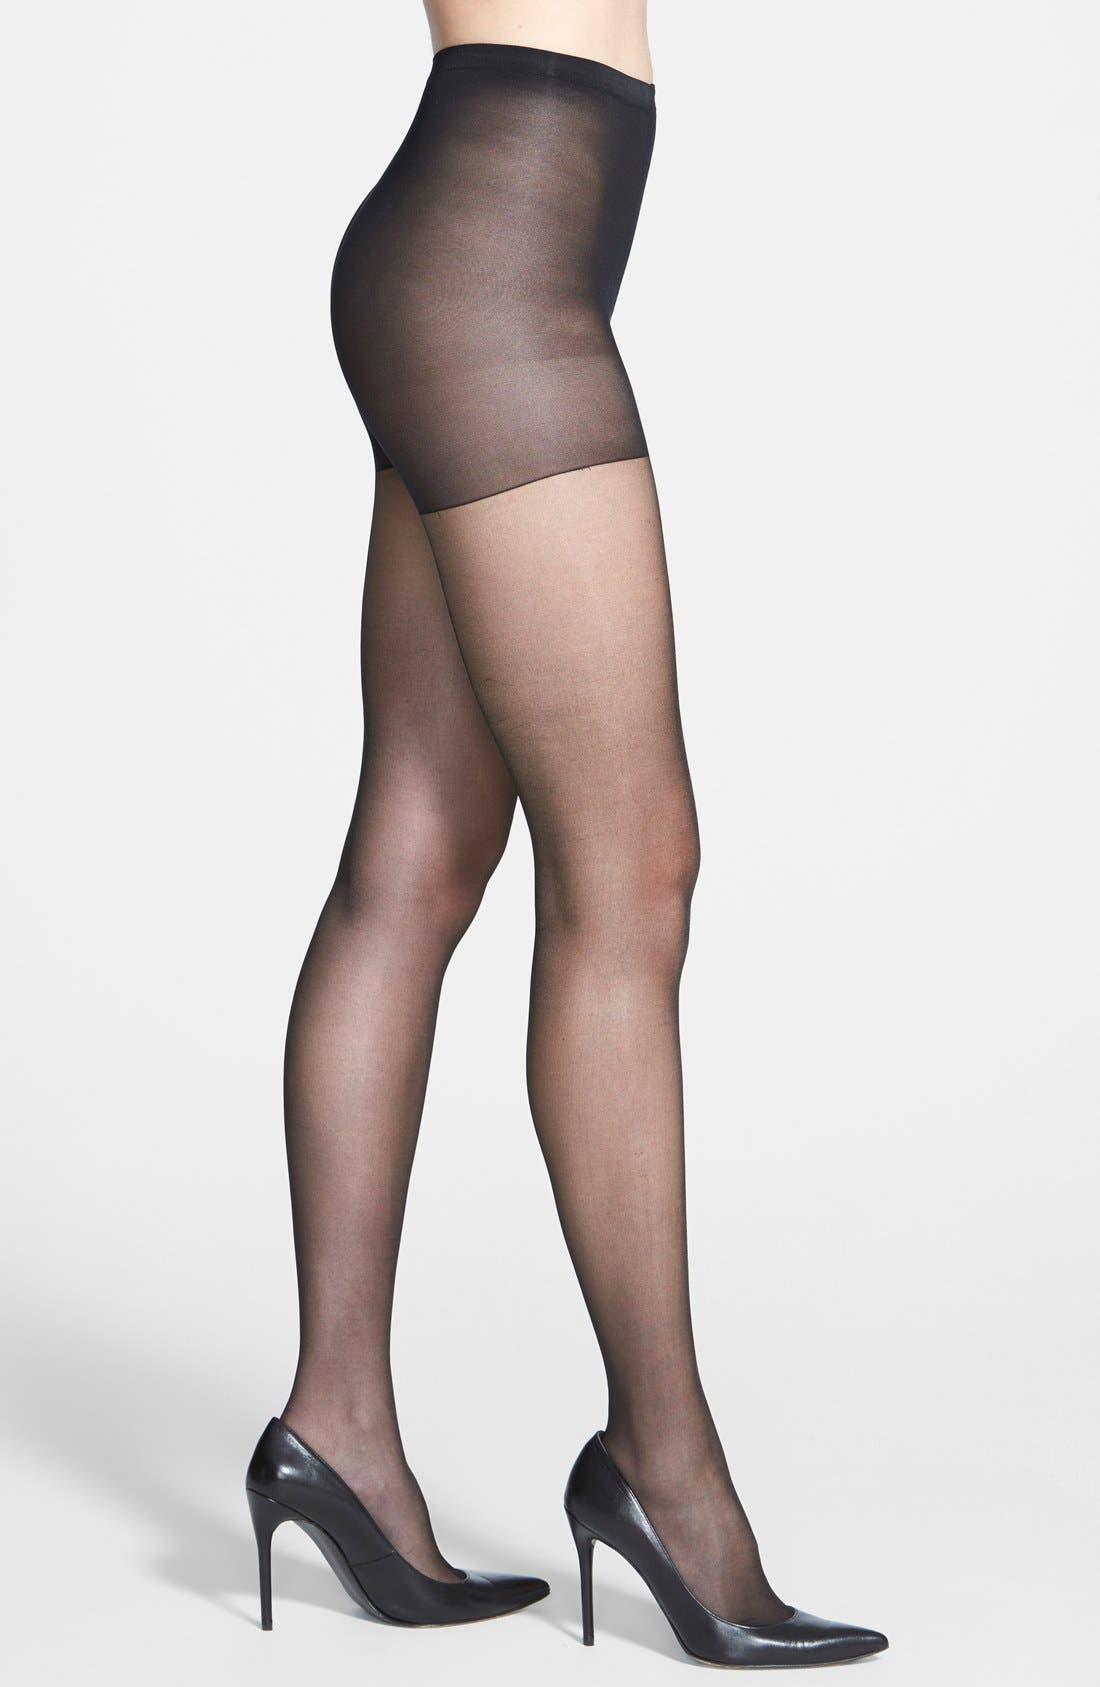 Main Image - Calvin Klein Shimmer Sheer Control Top Pantyhose